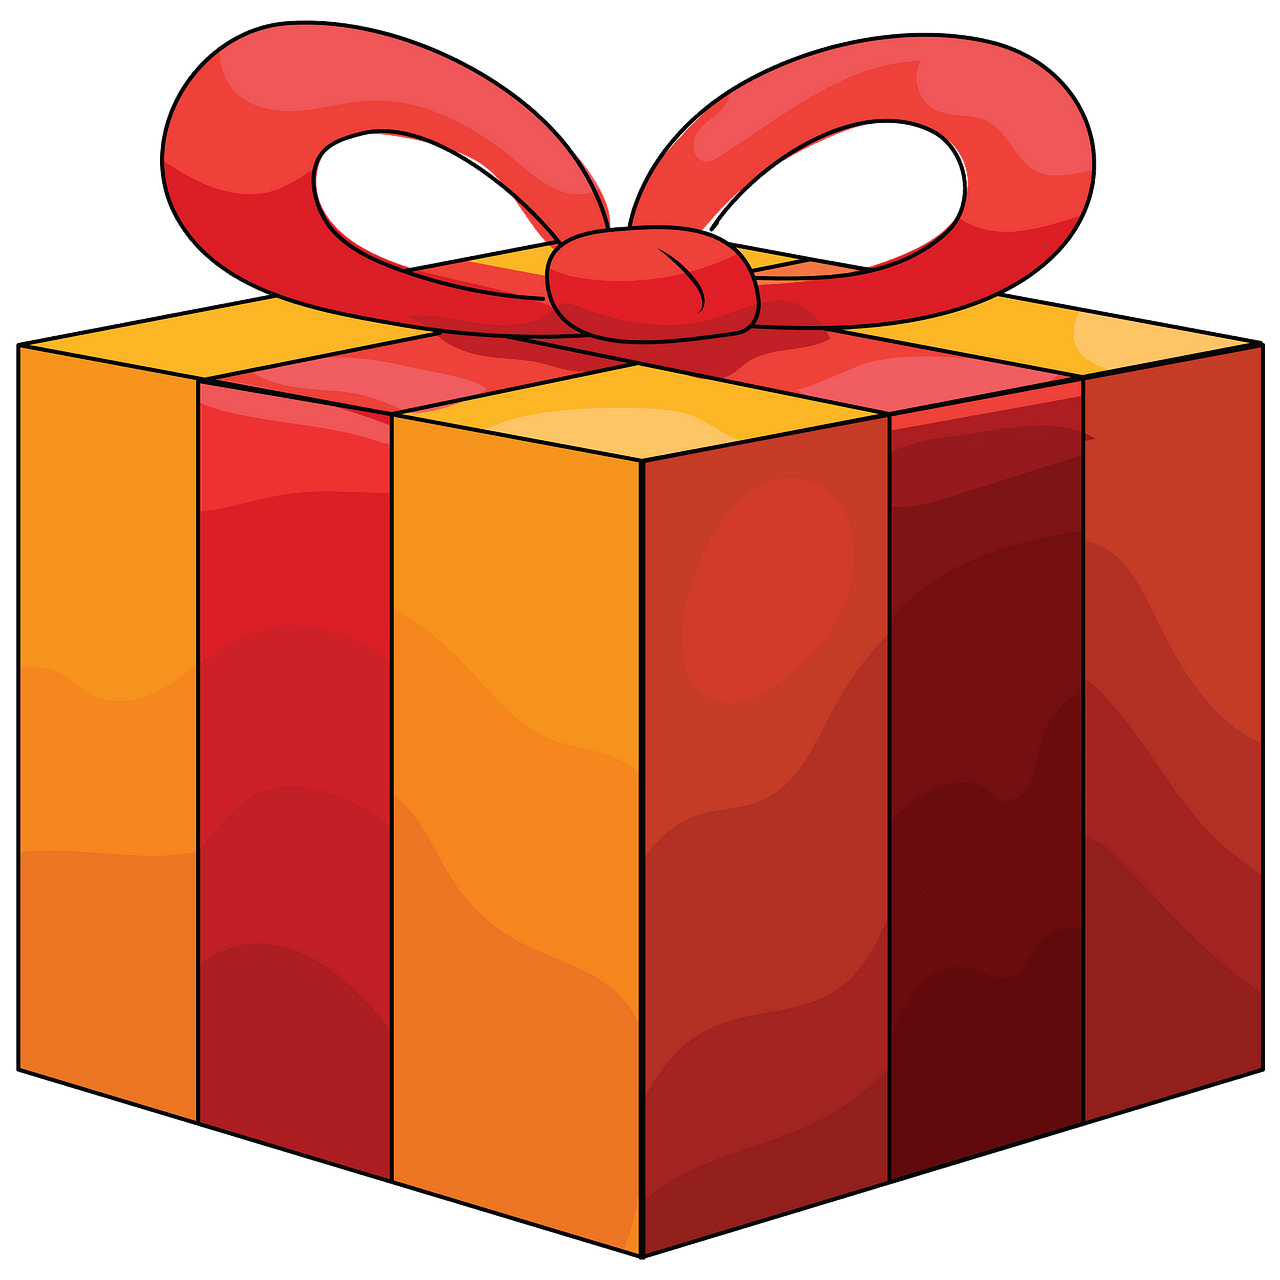 Caja de regalo naranja con cinta roja clipart. Dibujos.